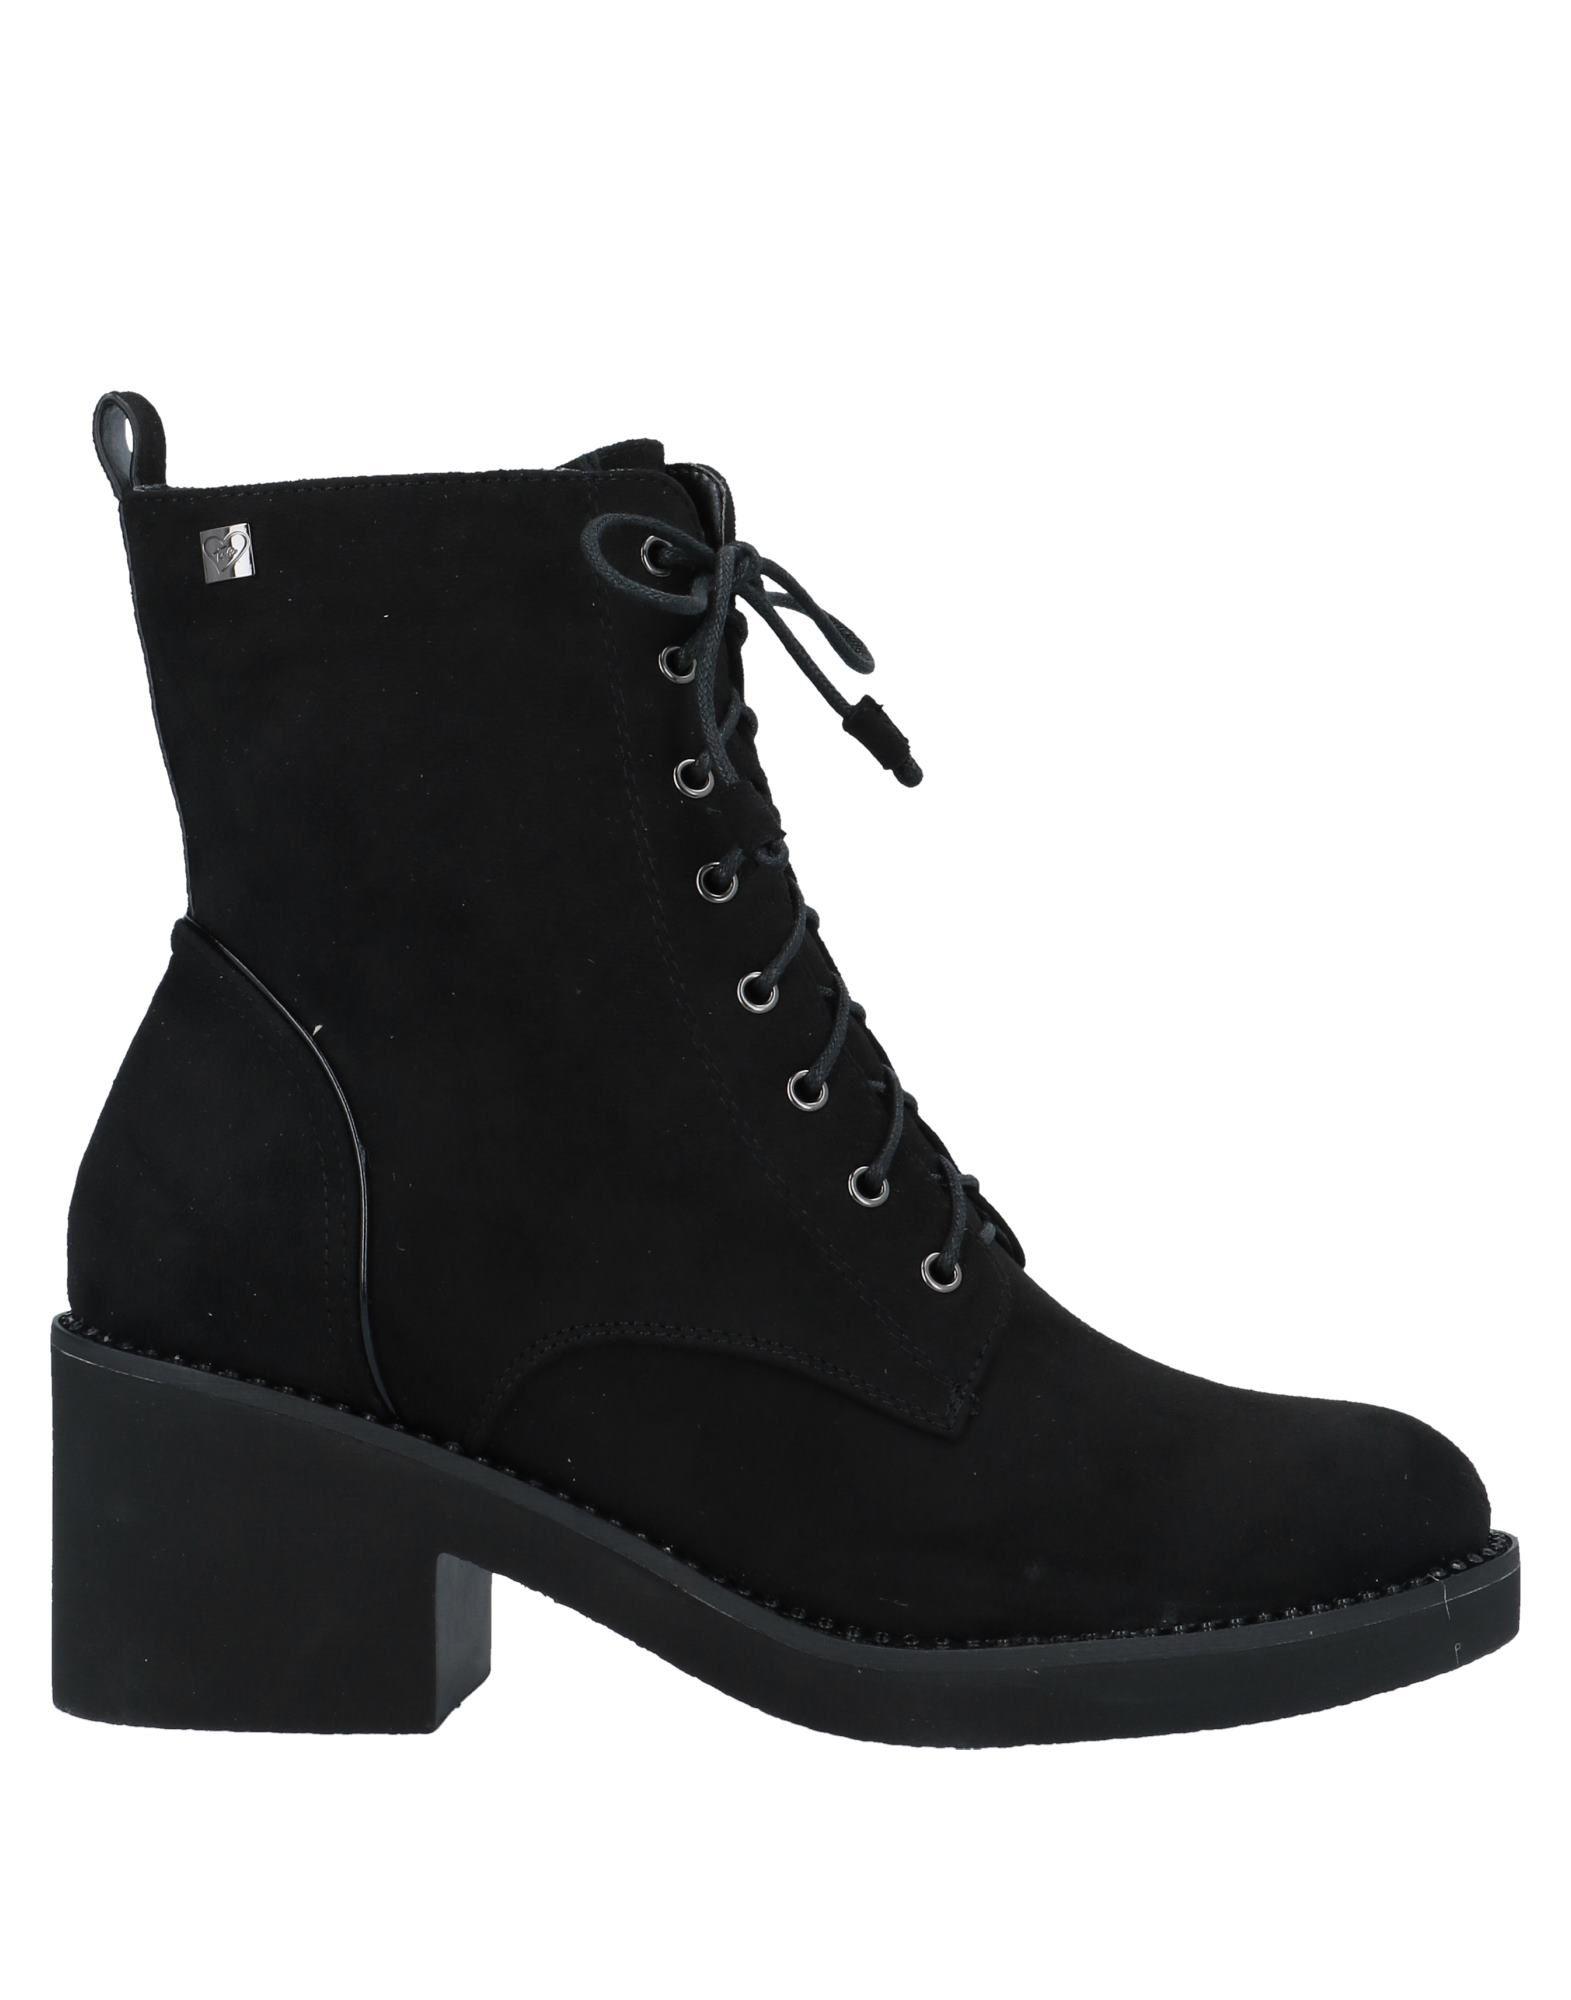 98ecf086fc05 TUA BY BRACCIALINI Полусапоги и высокие ботинки